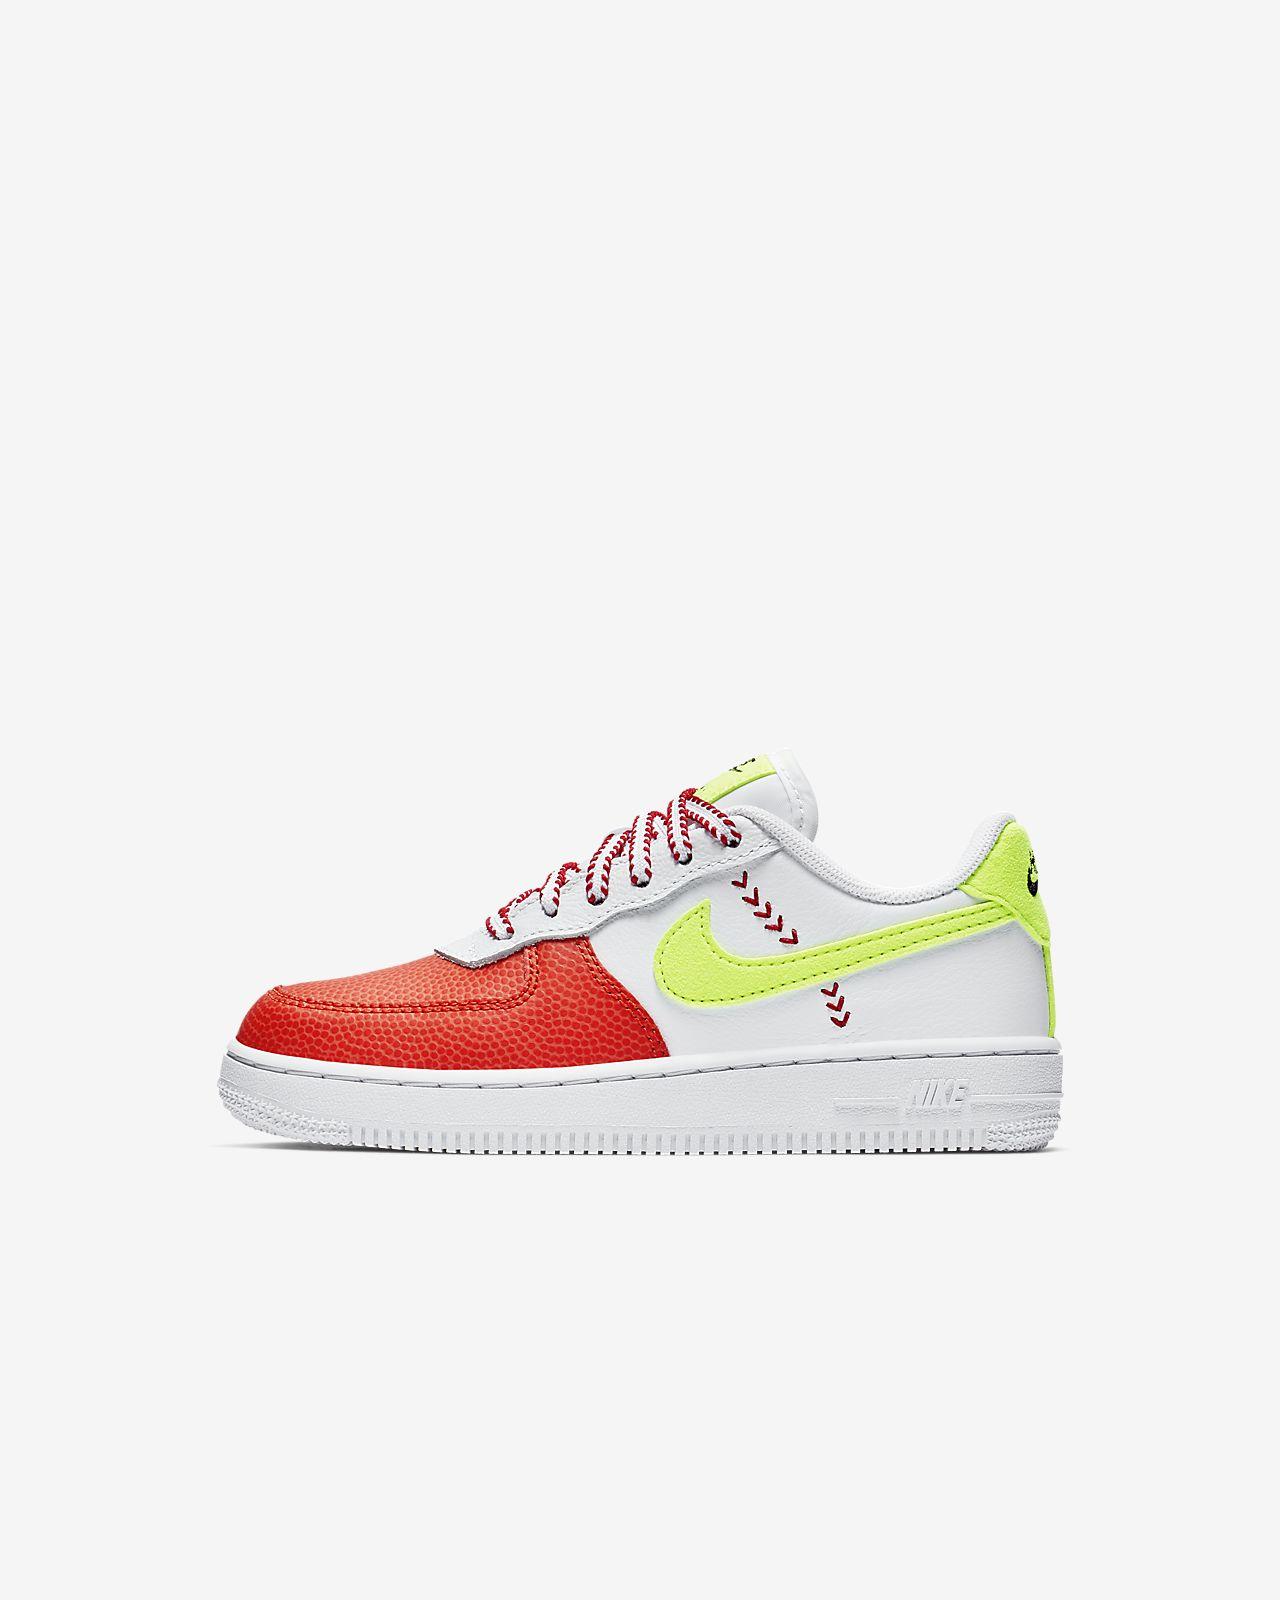 Nike Force 1 LV8 SB Little Kids' Shoe